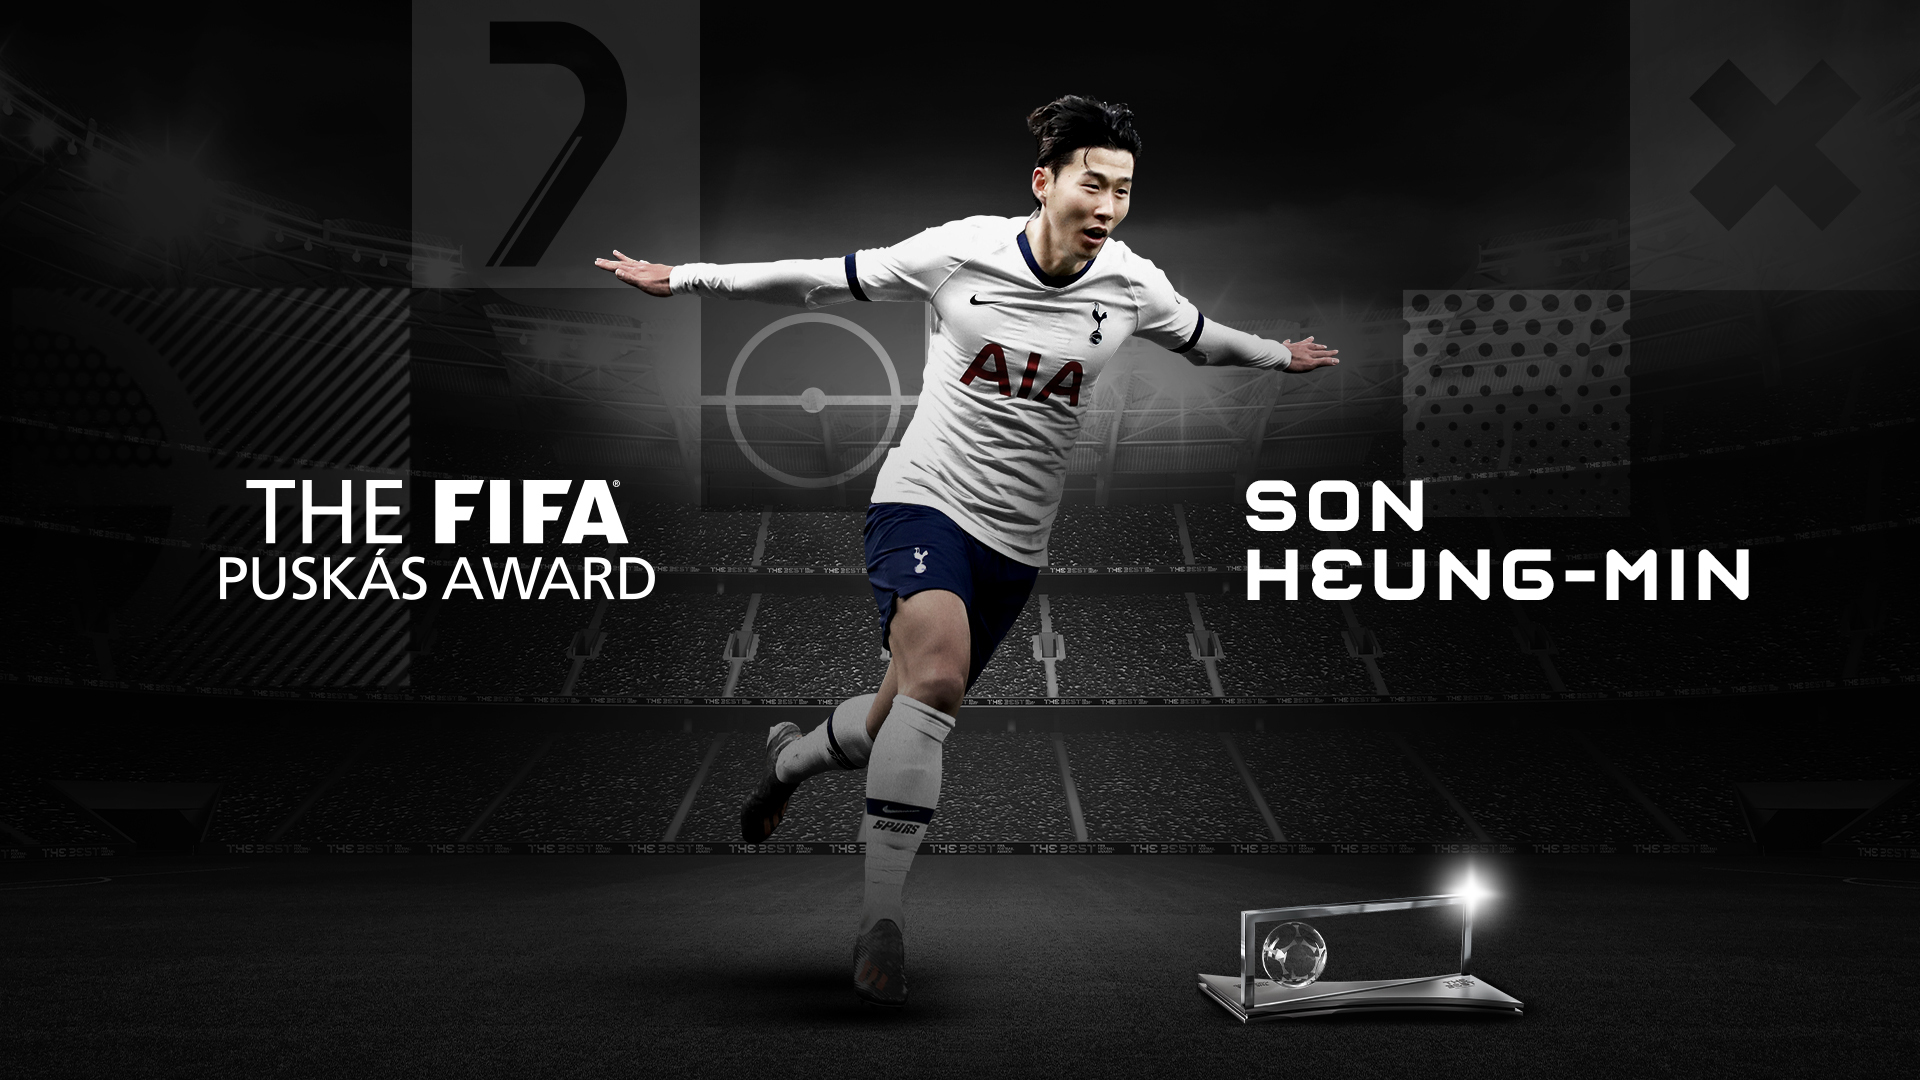 Premio Puskás de la FIFA